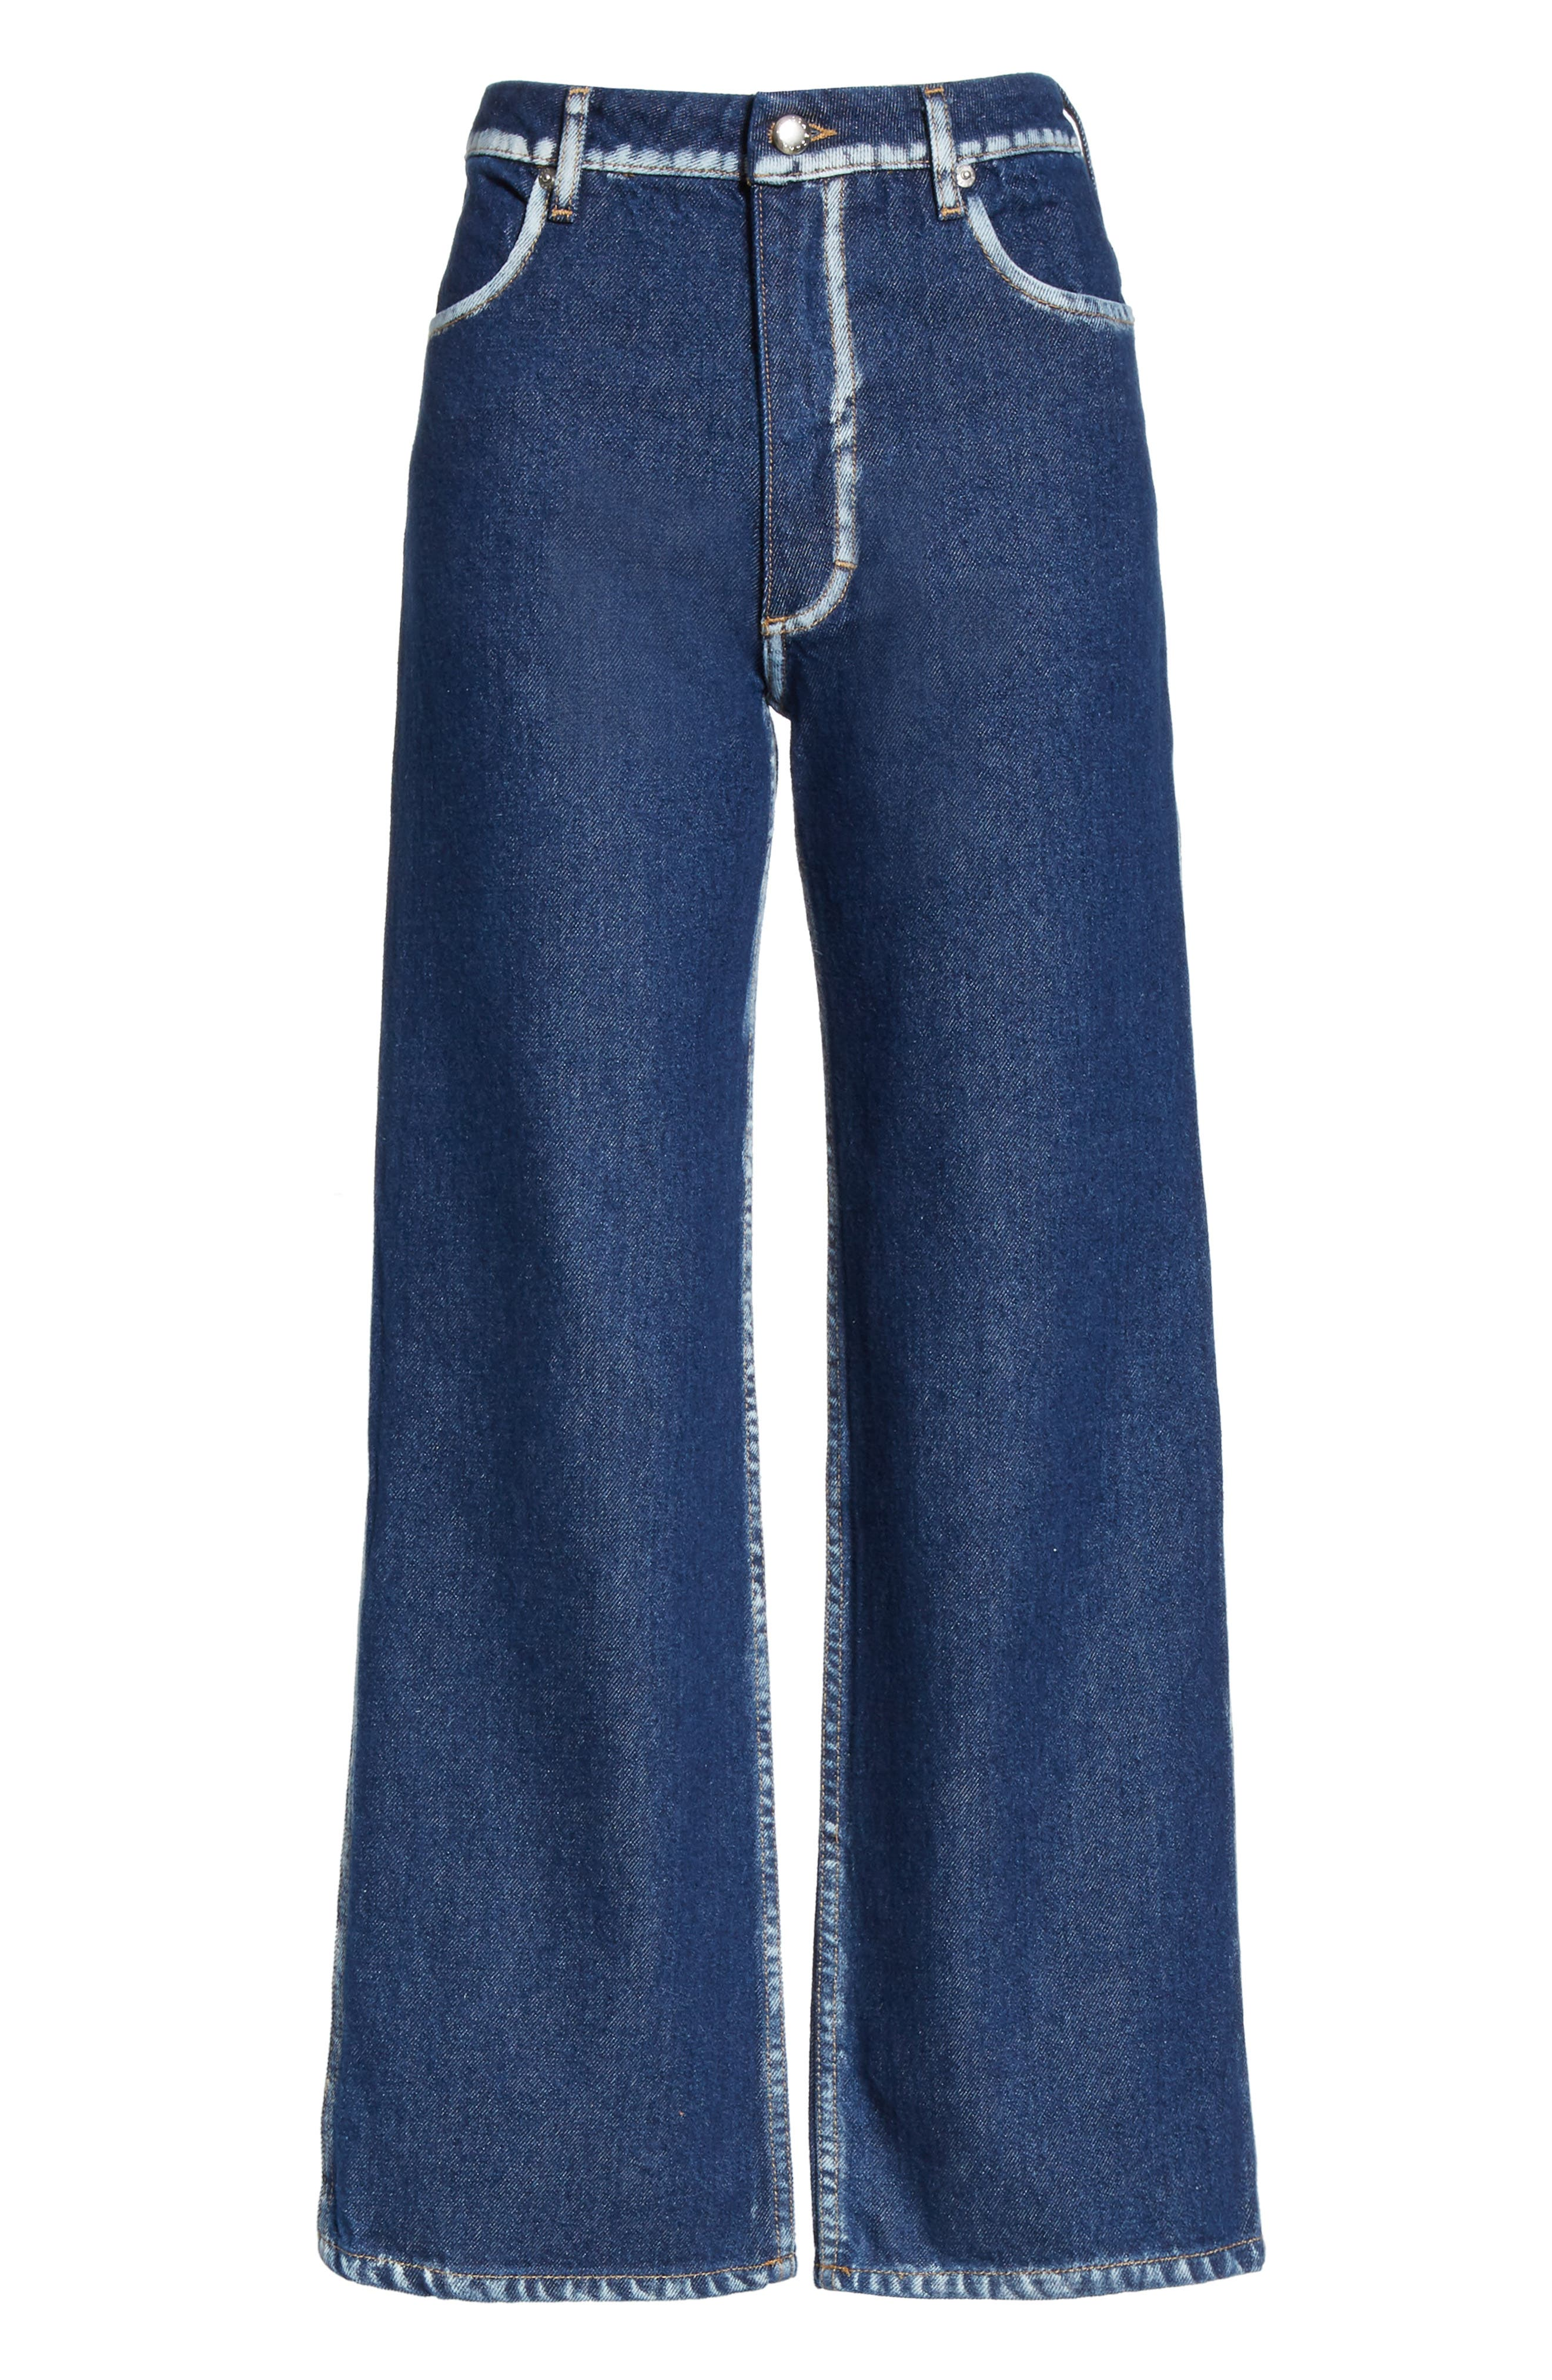 EL Painted Seam Wide Leg Jeans,                             Alternate thumbnail 6, color,                             BLUE SEAM PAINTING